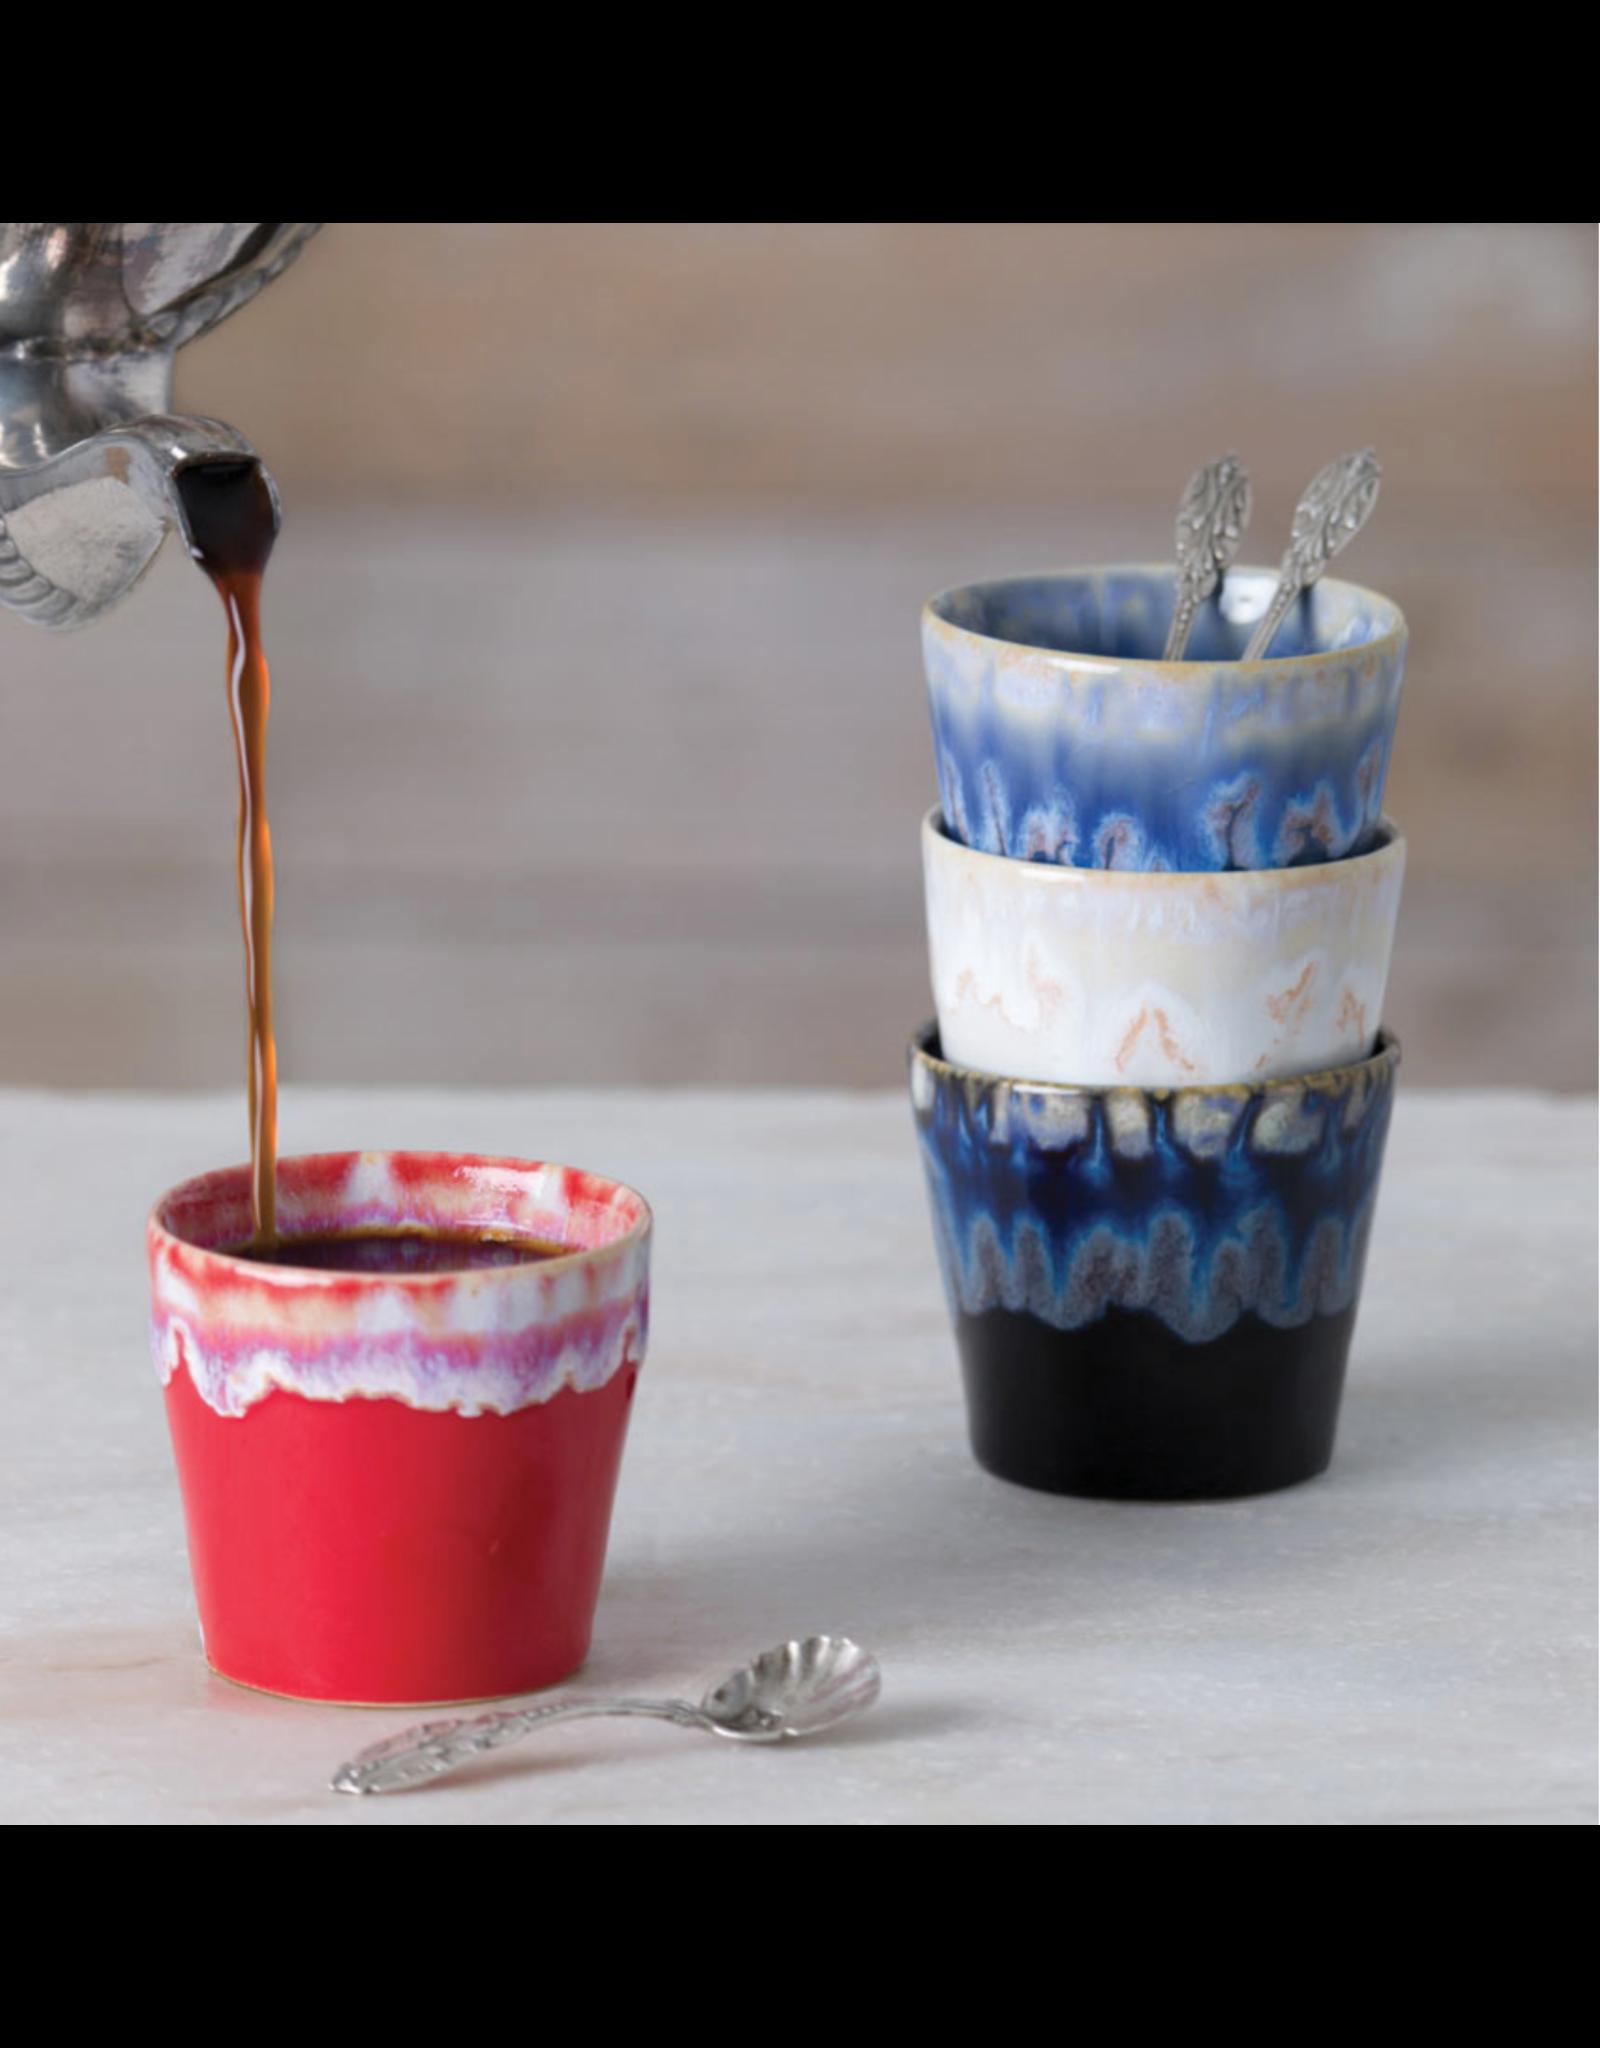 Kitchen Trend Grespresso kopje rood